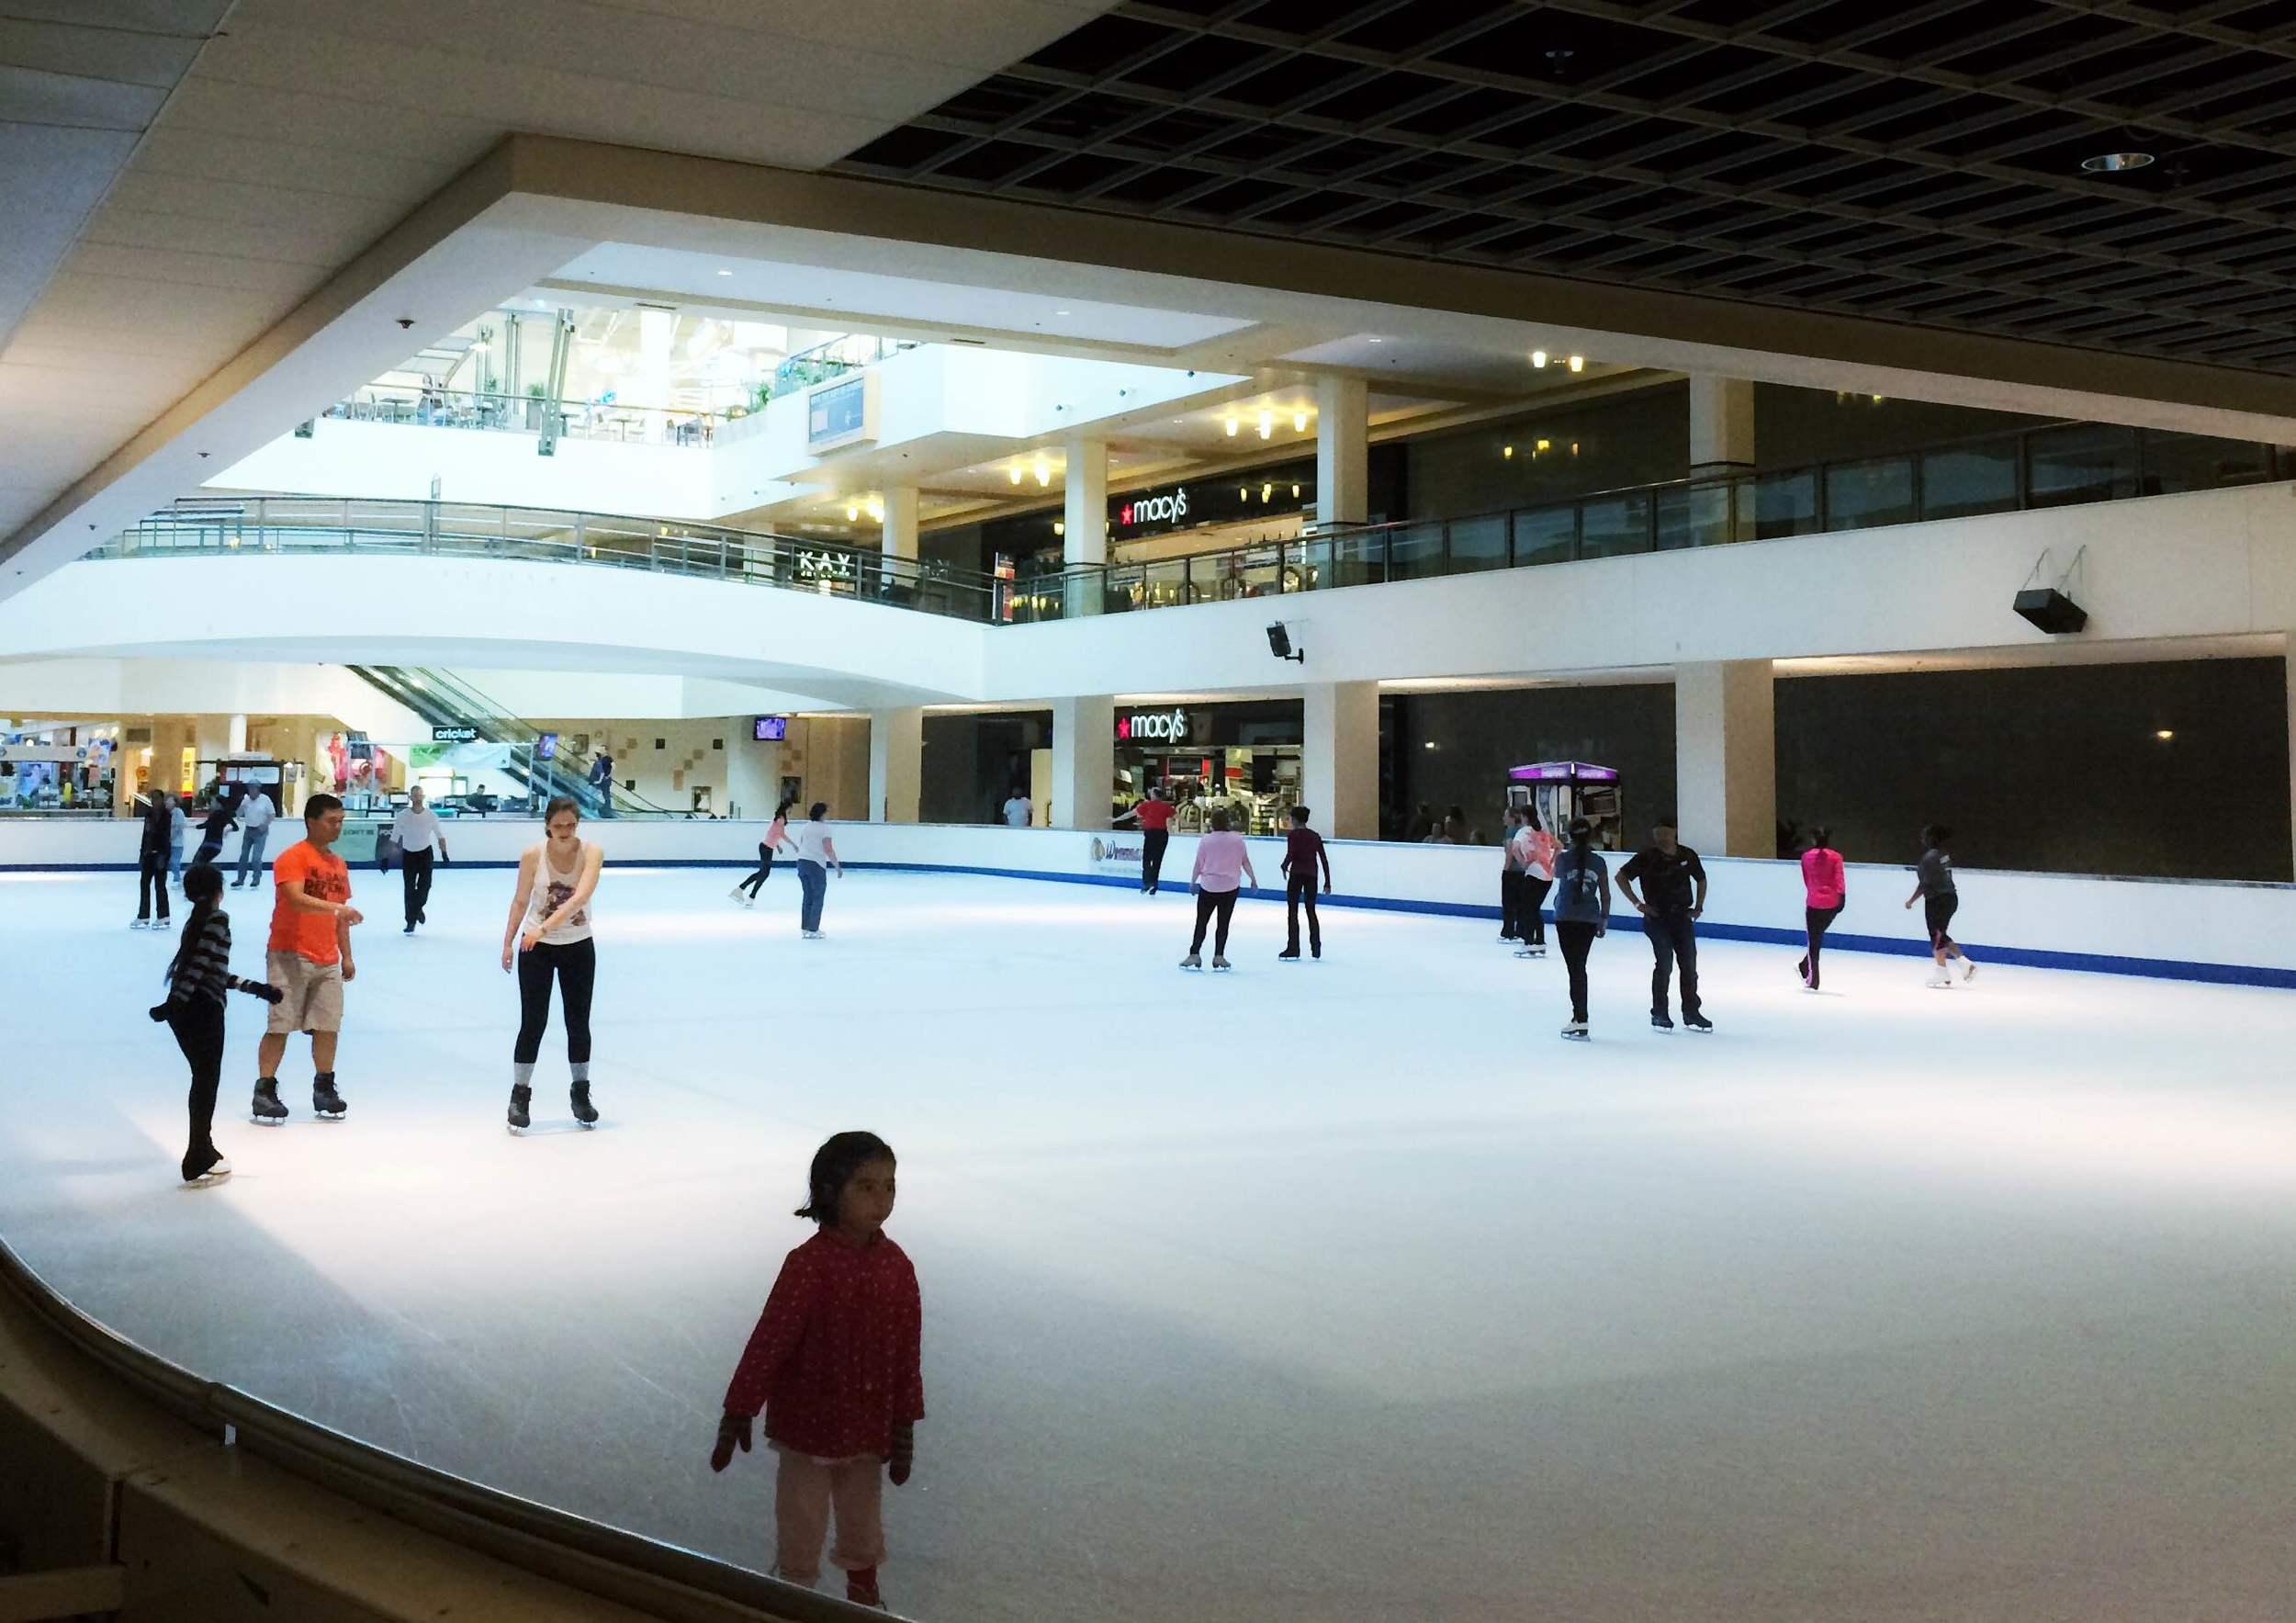 The ice skating rink inside Lloyd Center Mall.